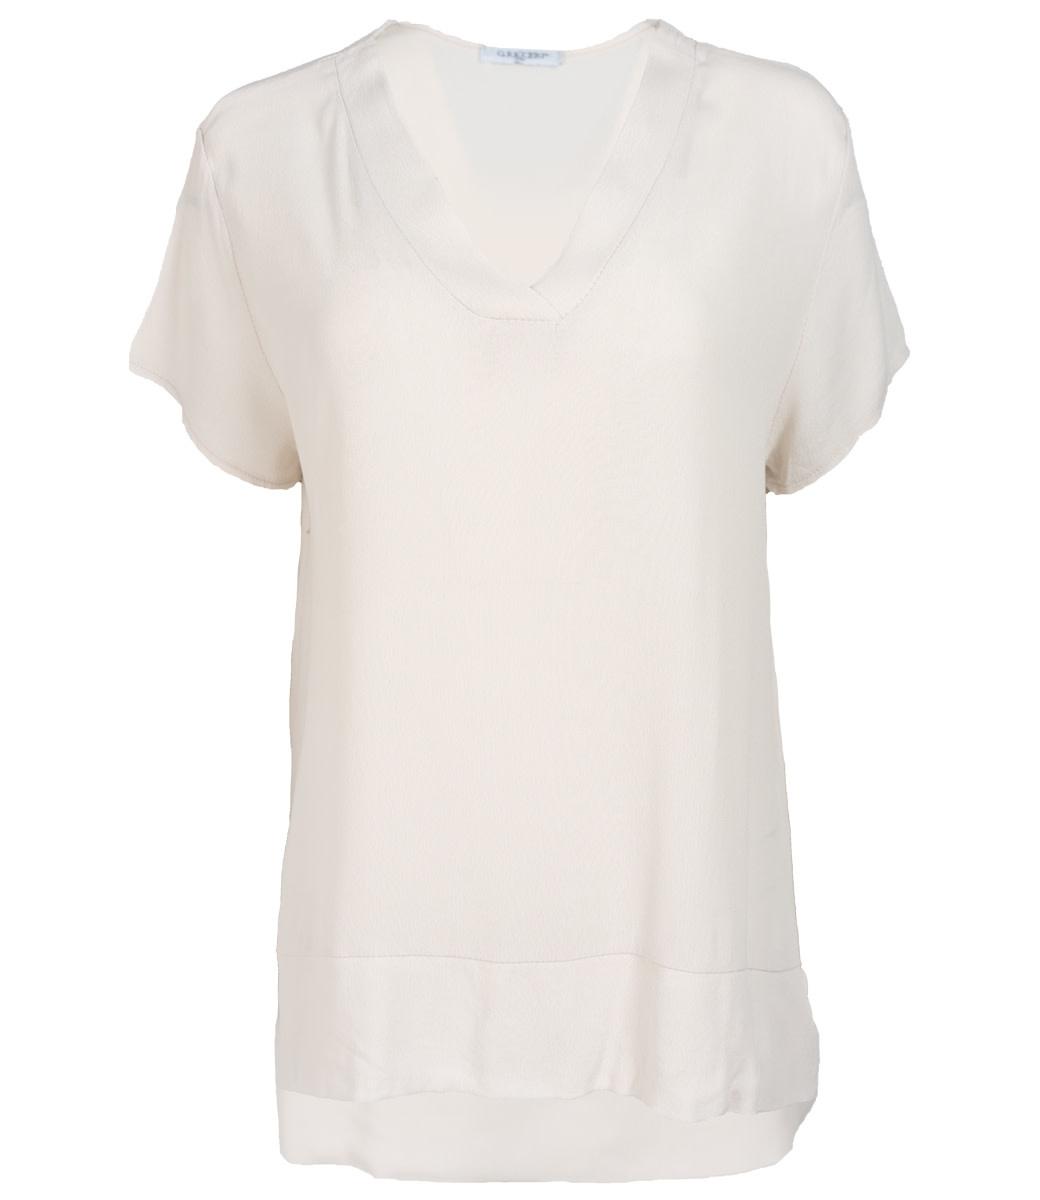 Gemma Ricceri Shirt beige v hals Macy